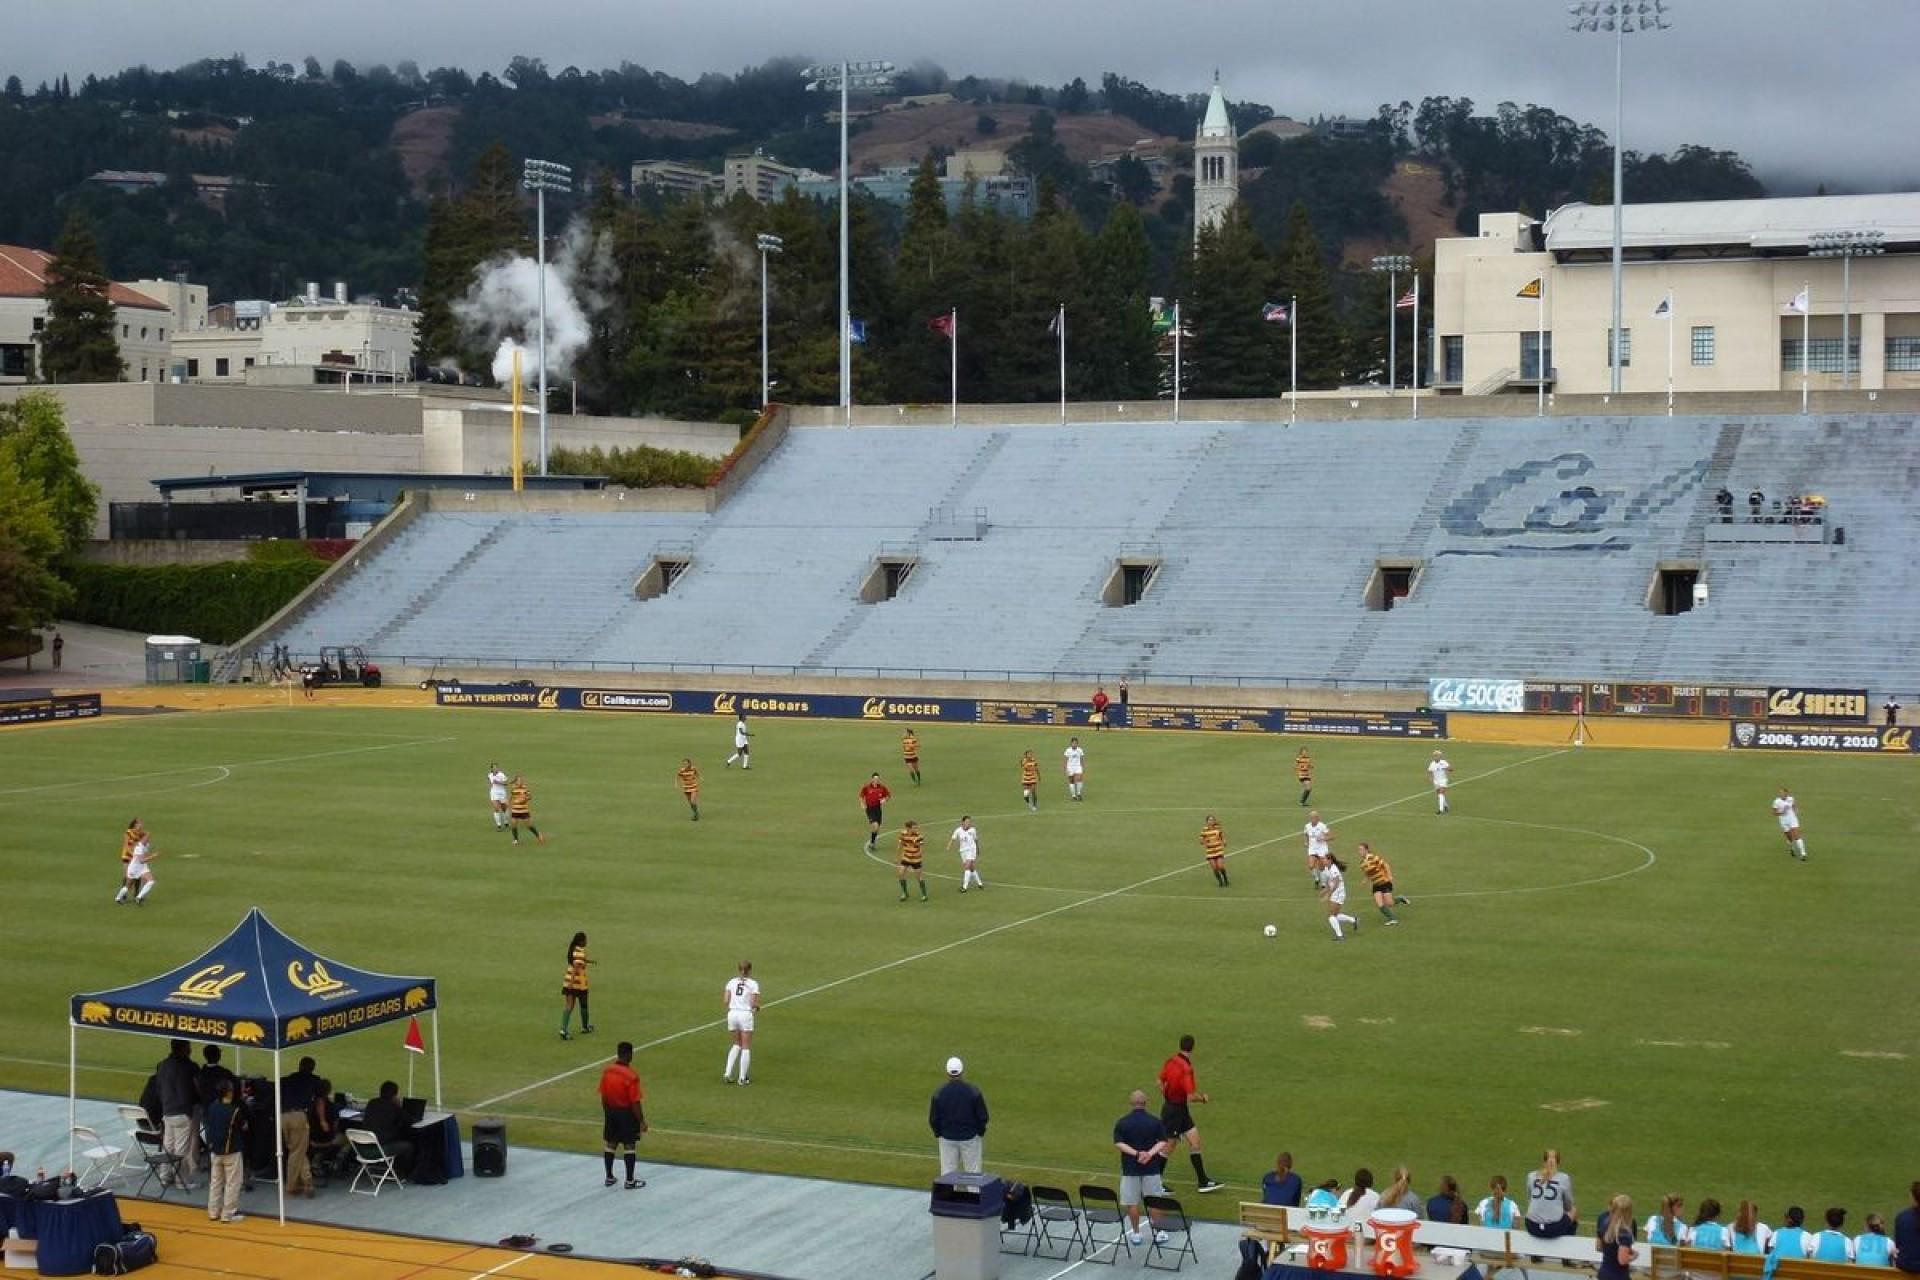 007 Essay Example P1170460 On Phenomenal Stadium A Newly Renovated Cricket Watching Match In Hindi 1920